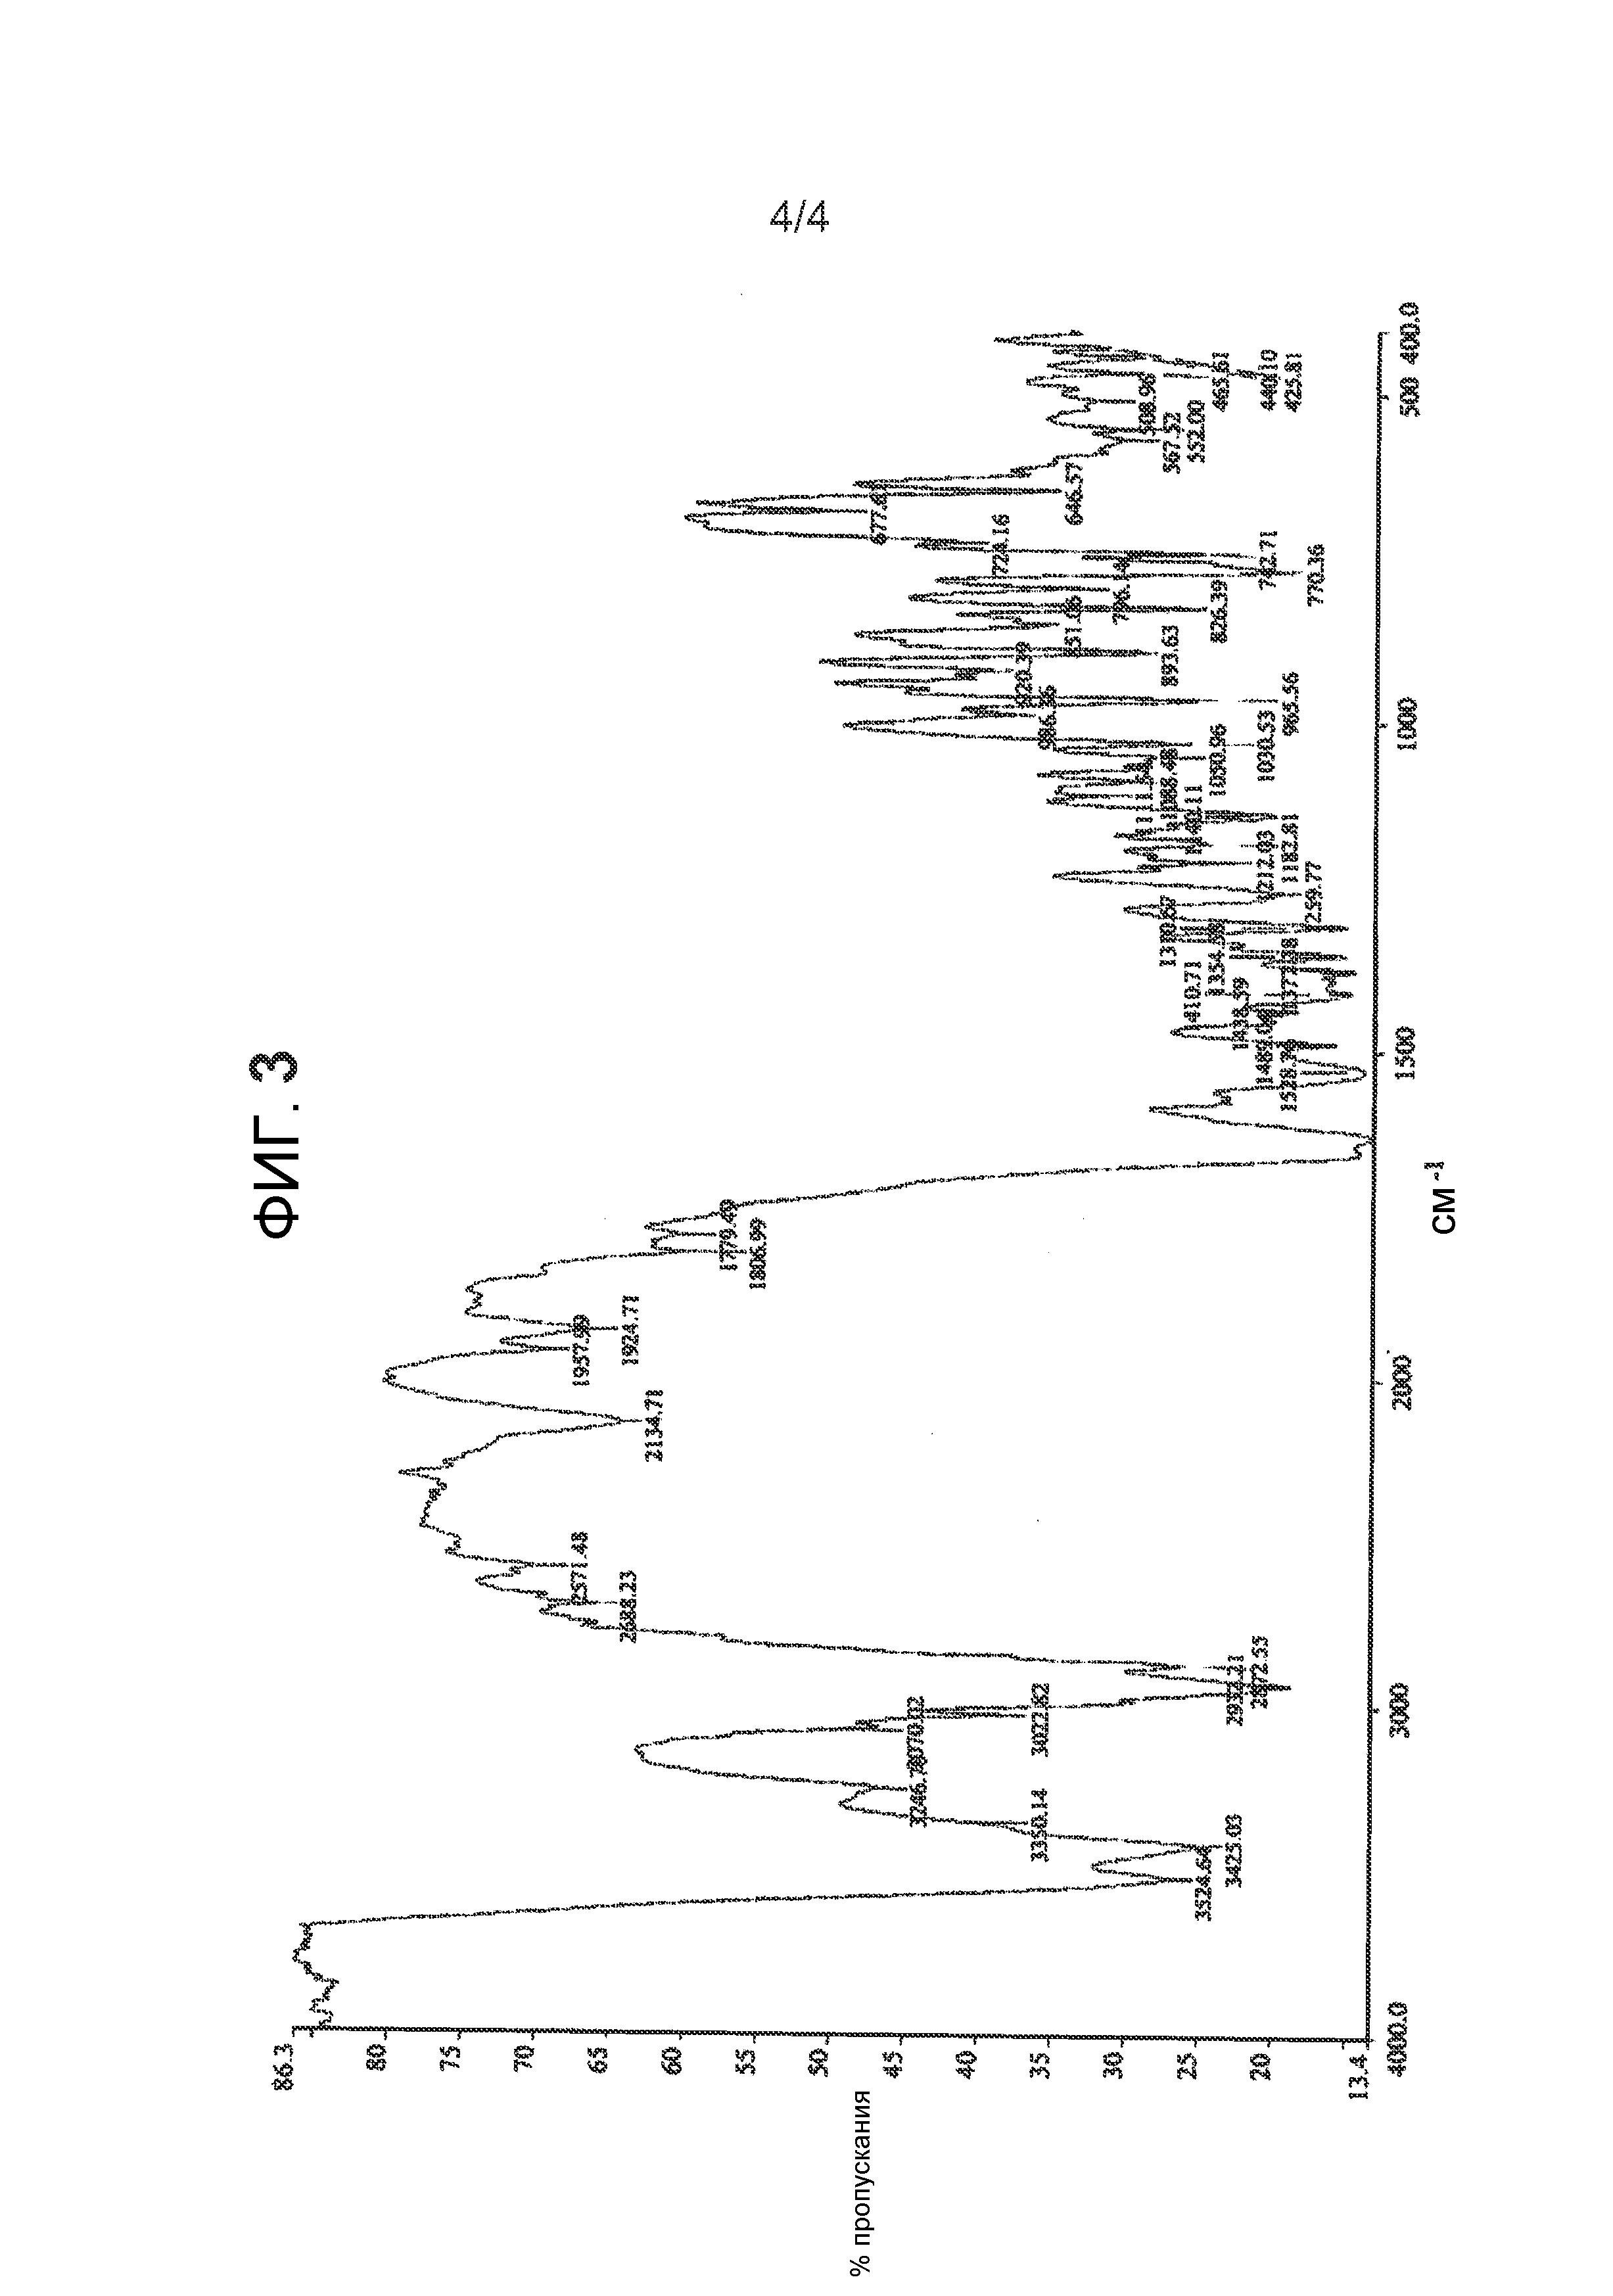 Способ получения 1-(2-метил-4-(2,3,4,5-тетрагидро-1-бензазепин-1-илкарбонил)бензилкарбамоил)-l-пролин-n,n-диметиламида